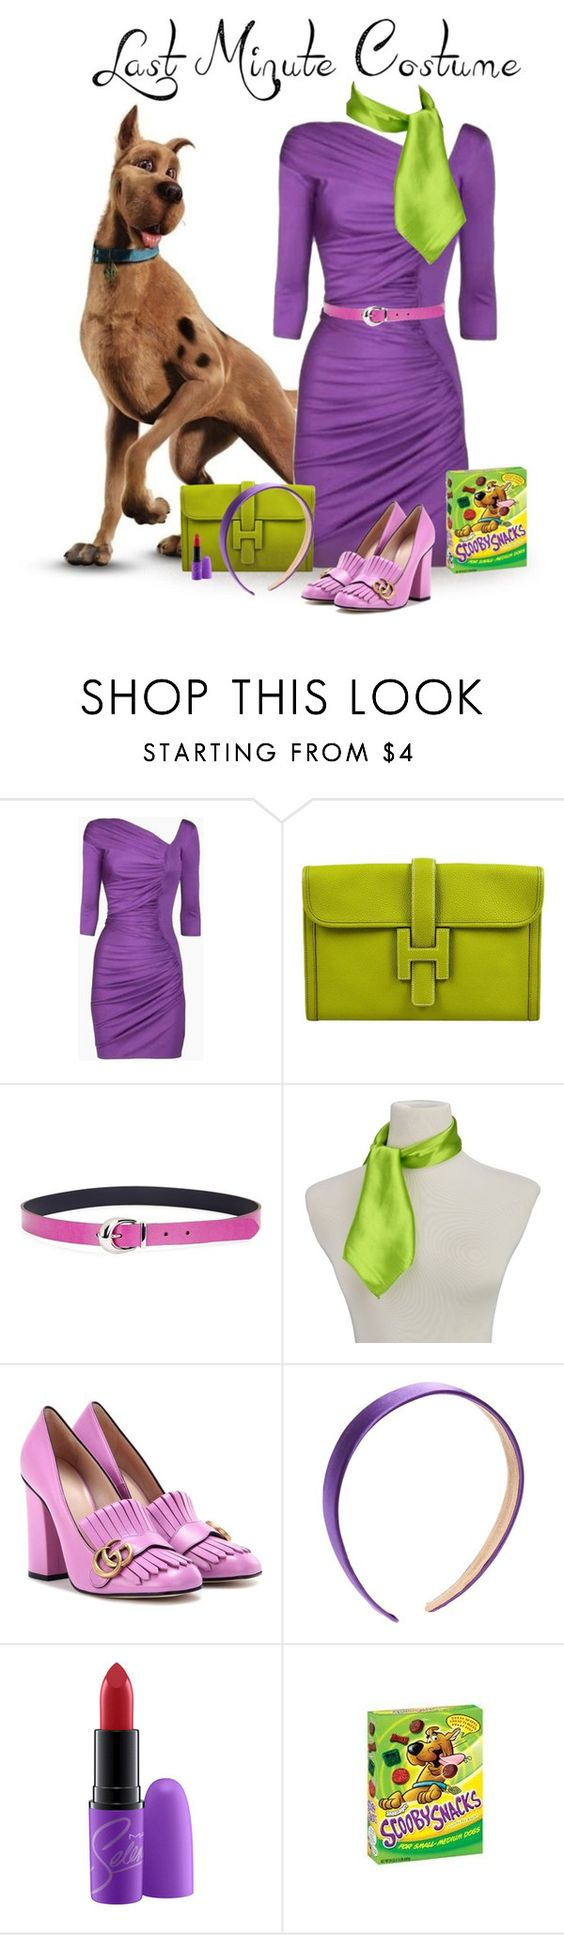 """Daphne"" by diane-hansen ❤ liked on Polyvore featuring Catherine Malandrino, Hermès, Lauren Ralph Lauren, Gucci, halloweencostume and lastminutecostume"